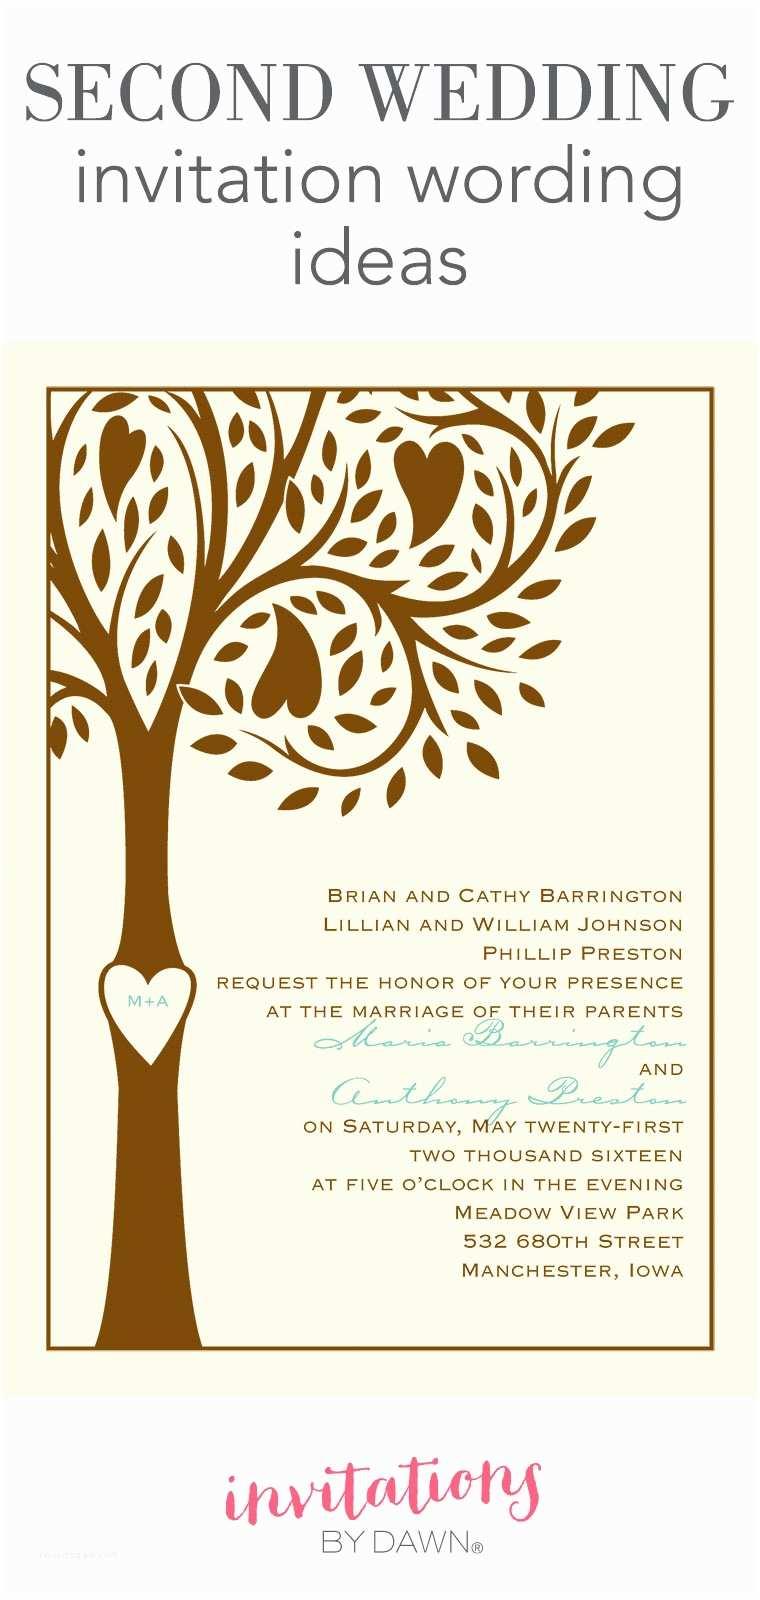 Wedding Invitation Phrases Second Wedding Invitation Wording